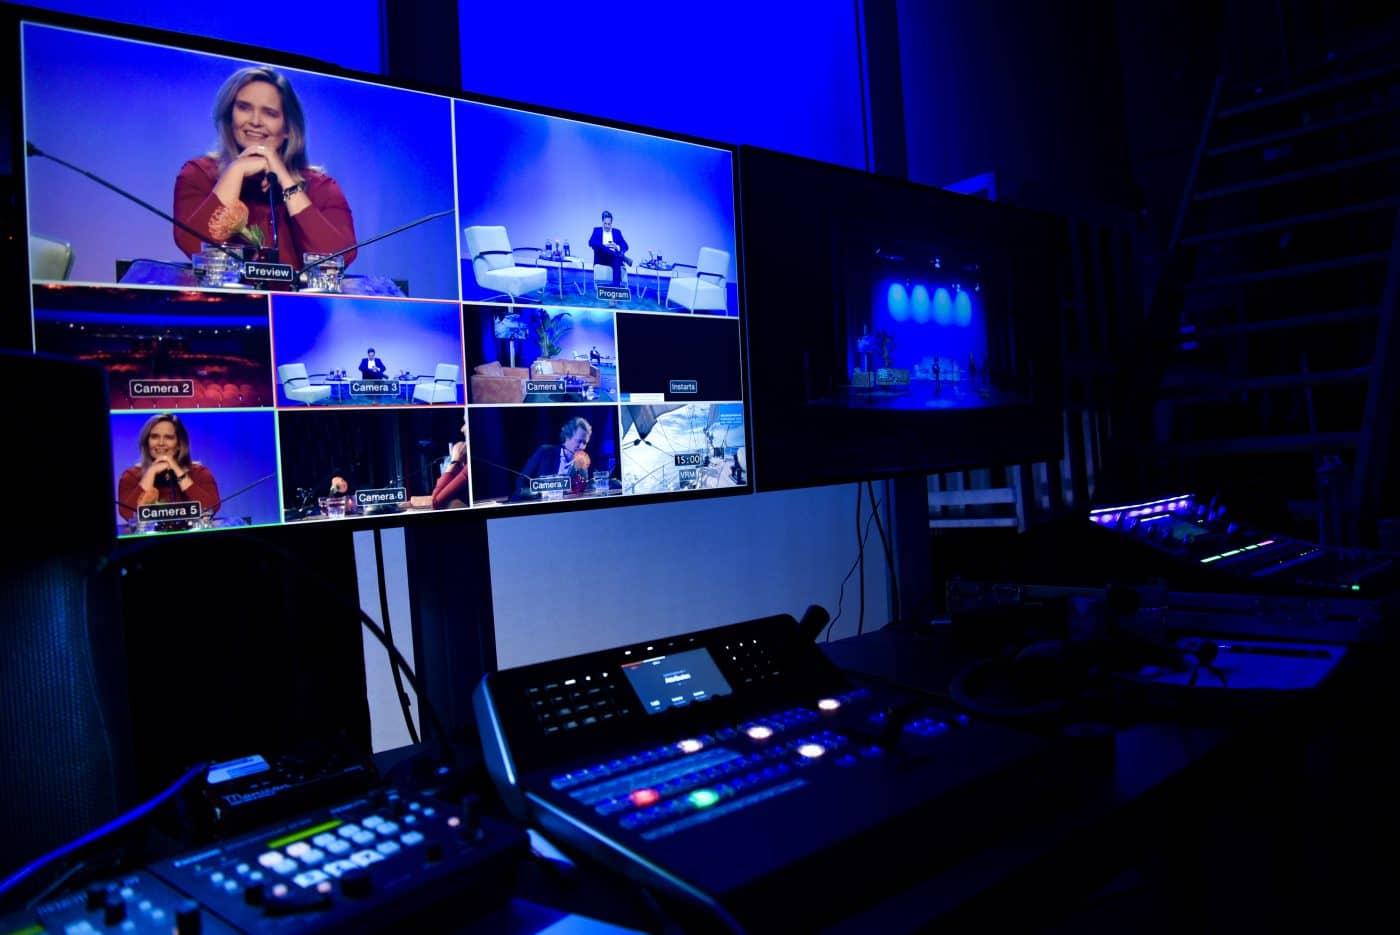 Studio Hilversum Theater achter de schermen